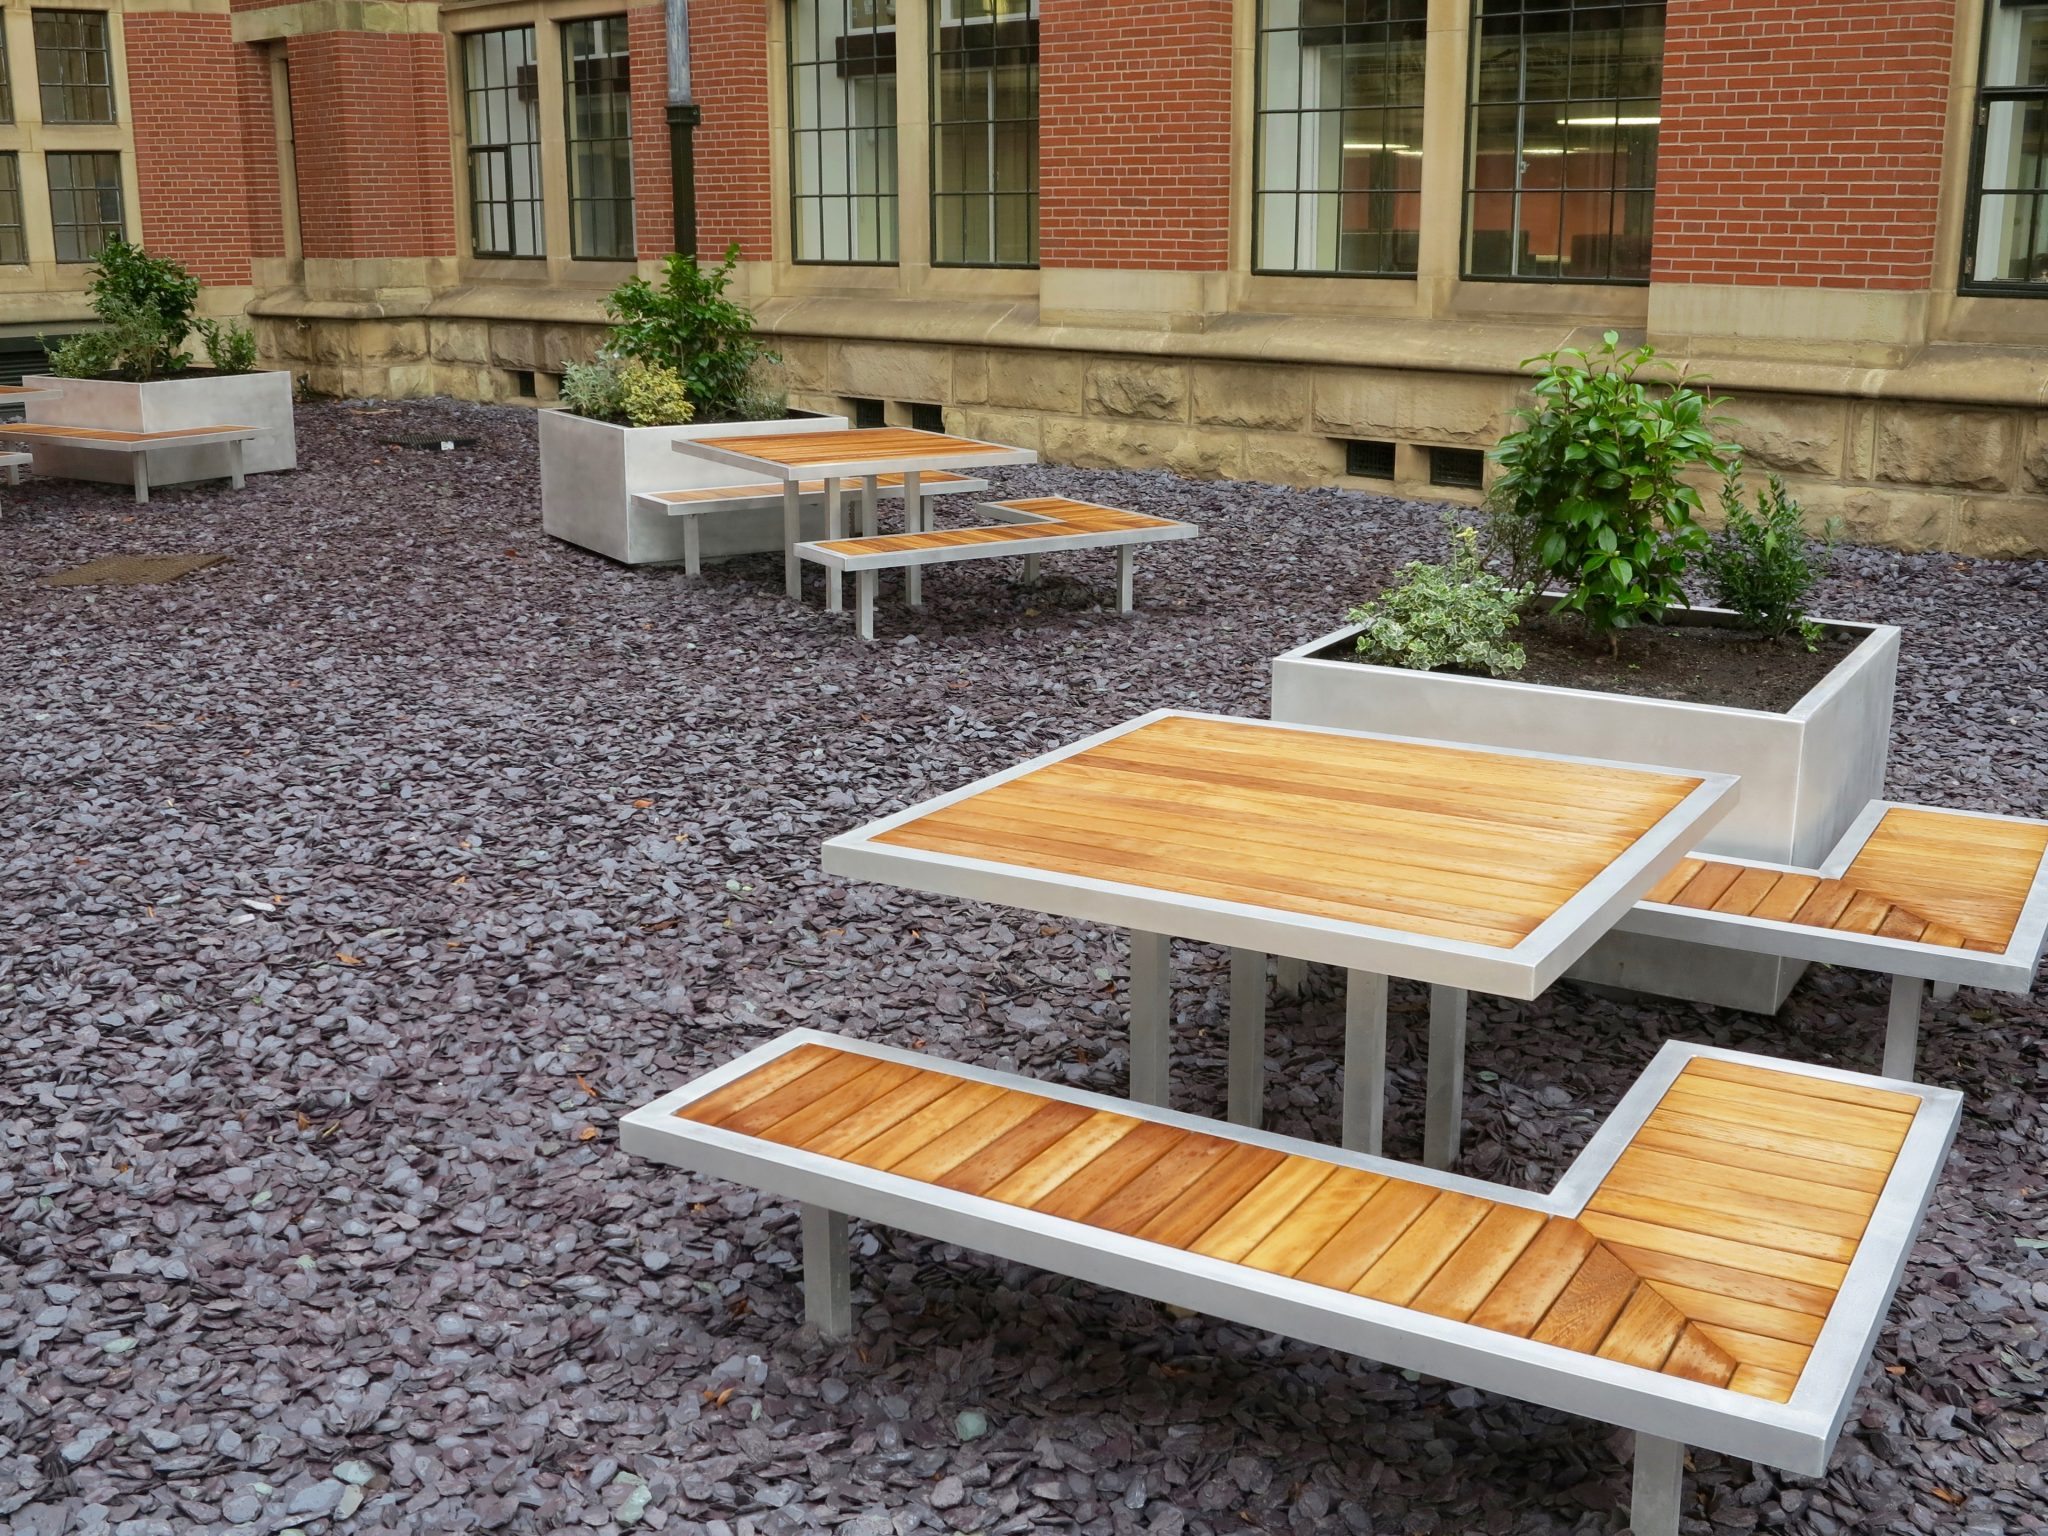 External furniture for the University of Birmingham